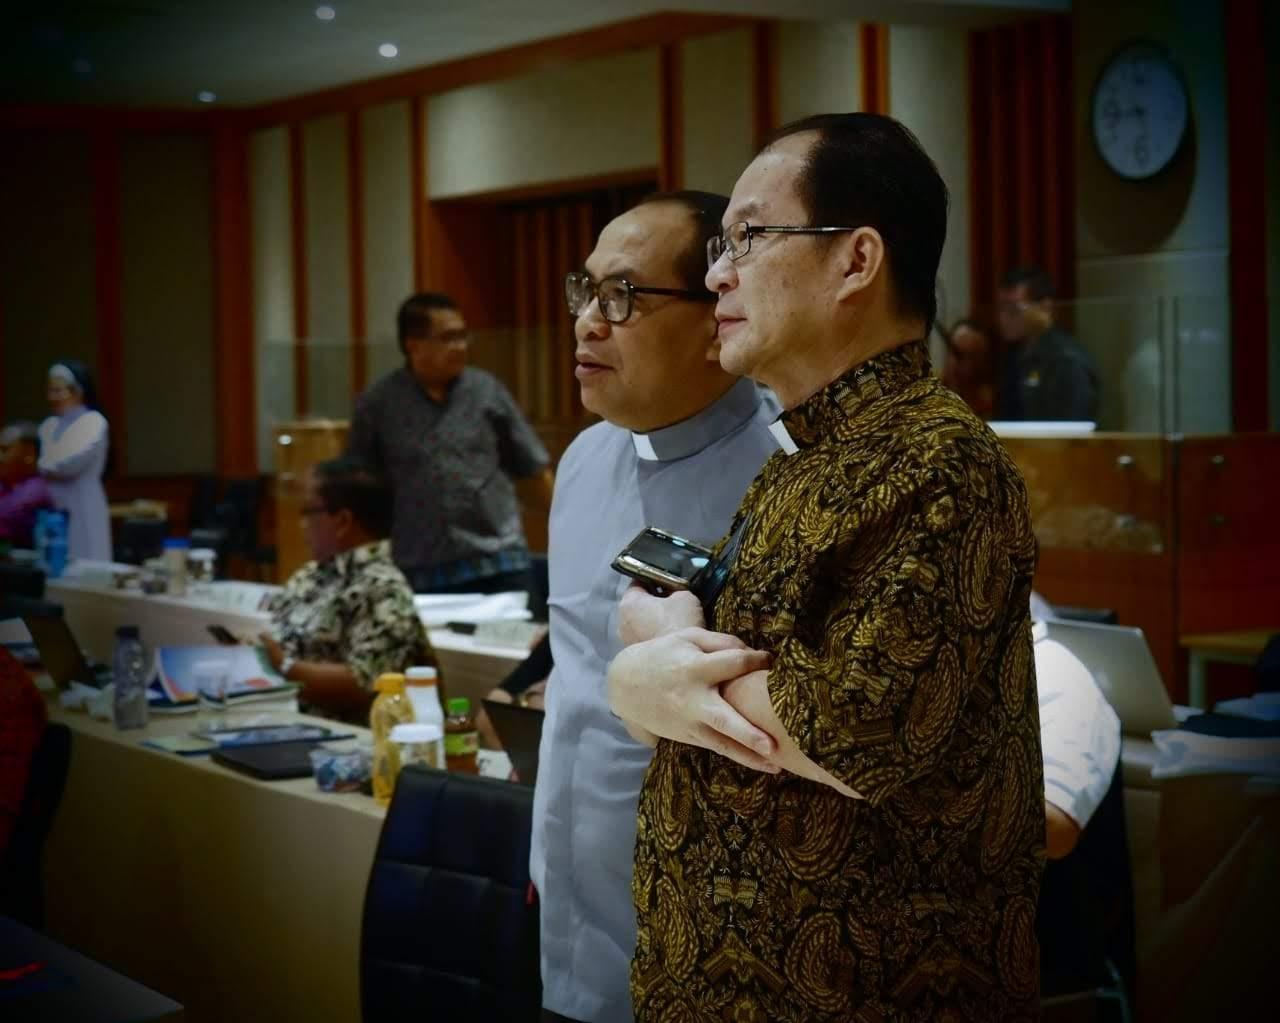 Dua dari tiga Direksi Kantor KWI dalam Sidang Tahunan KWI di Gedung Puspas Bumi Silih Asih, Jalan Moh. Ramdan, Bandung (Rabu, 6 Nov 2019)